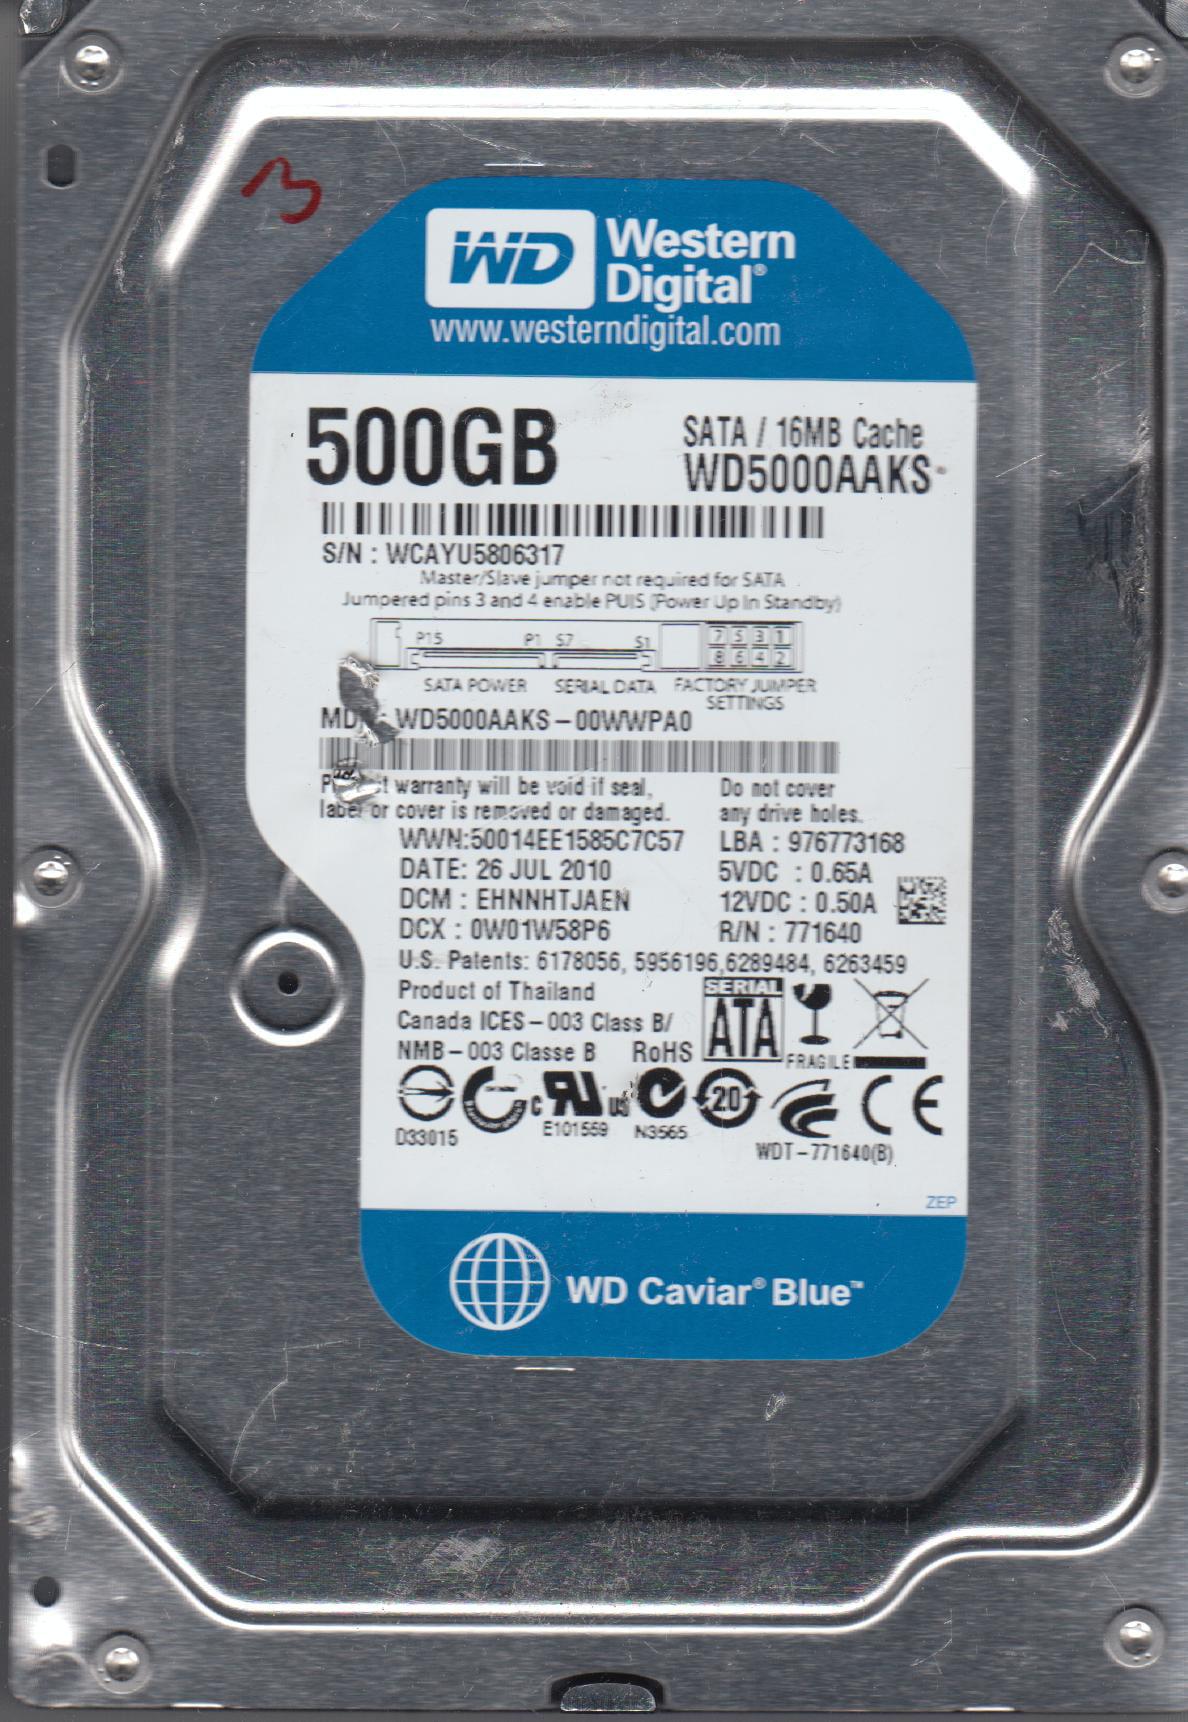 WD5000AAKS-00WWPA0, DCM EHNNHTJAEN, Western Digital 500GB SATA 3.5 Hard Drive by WD